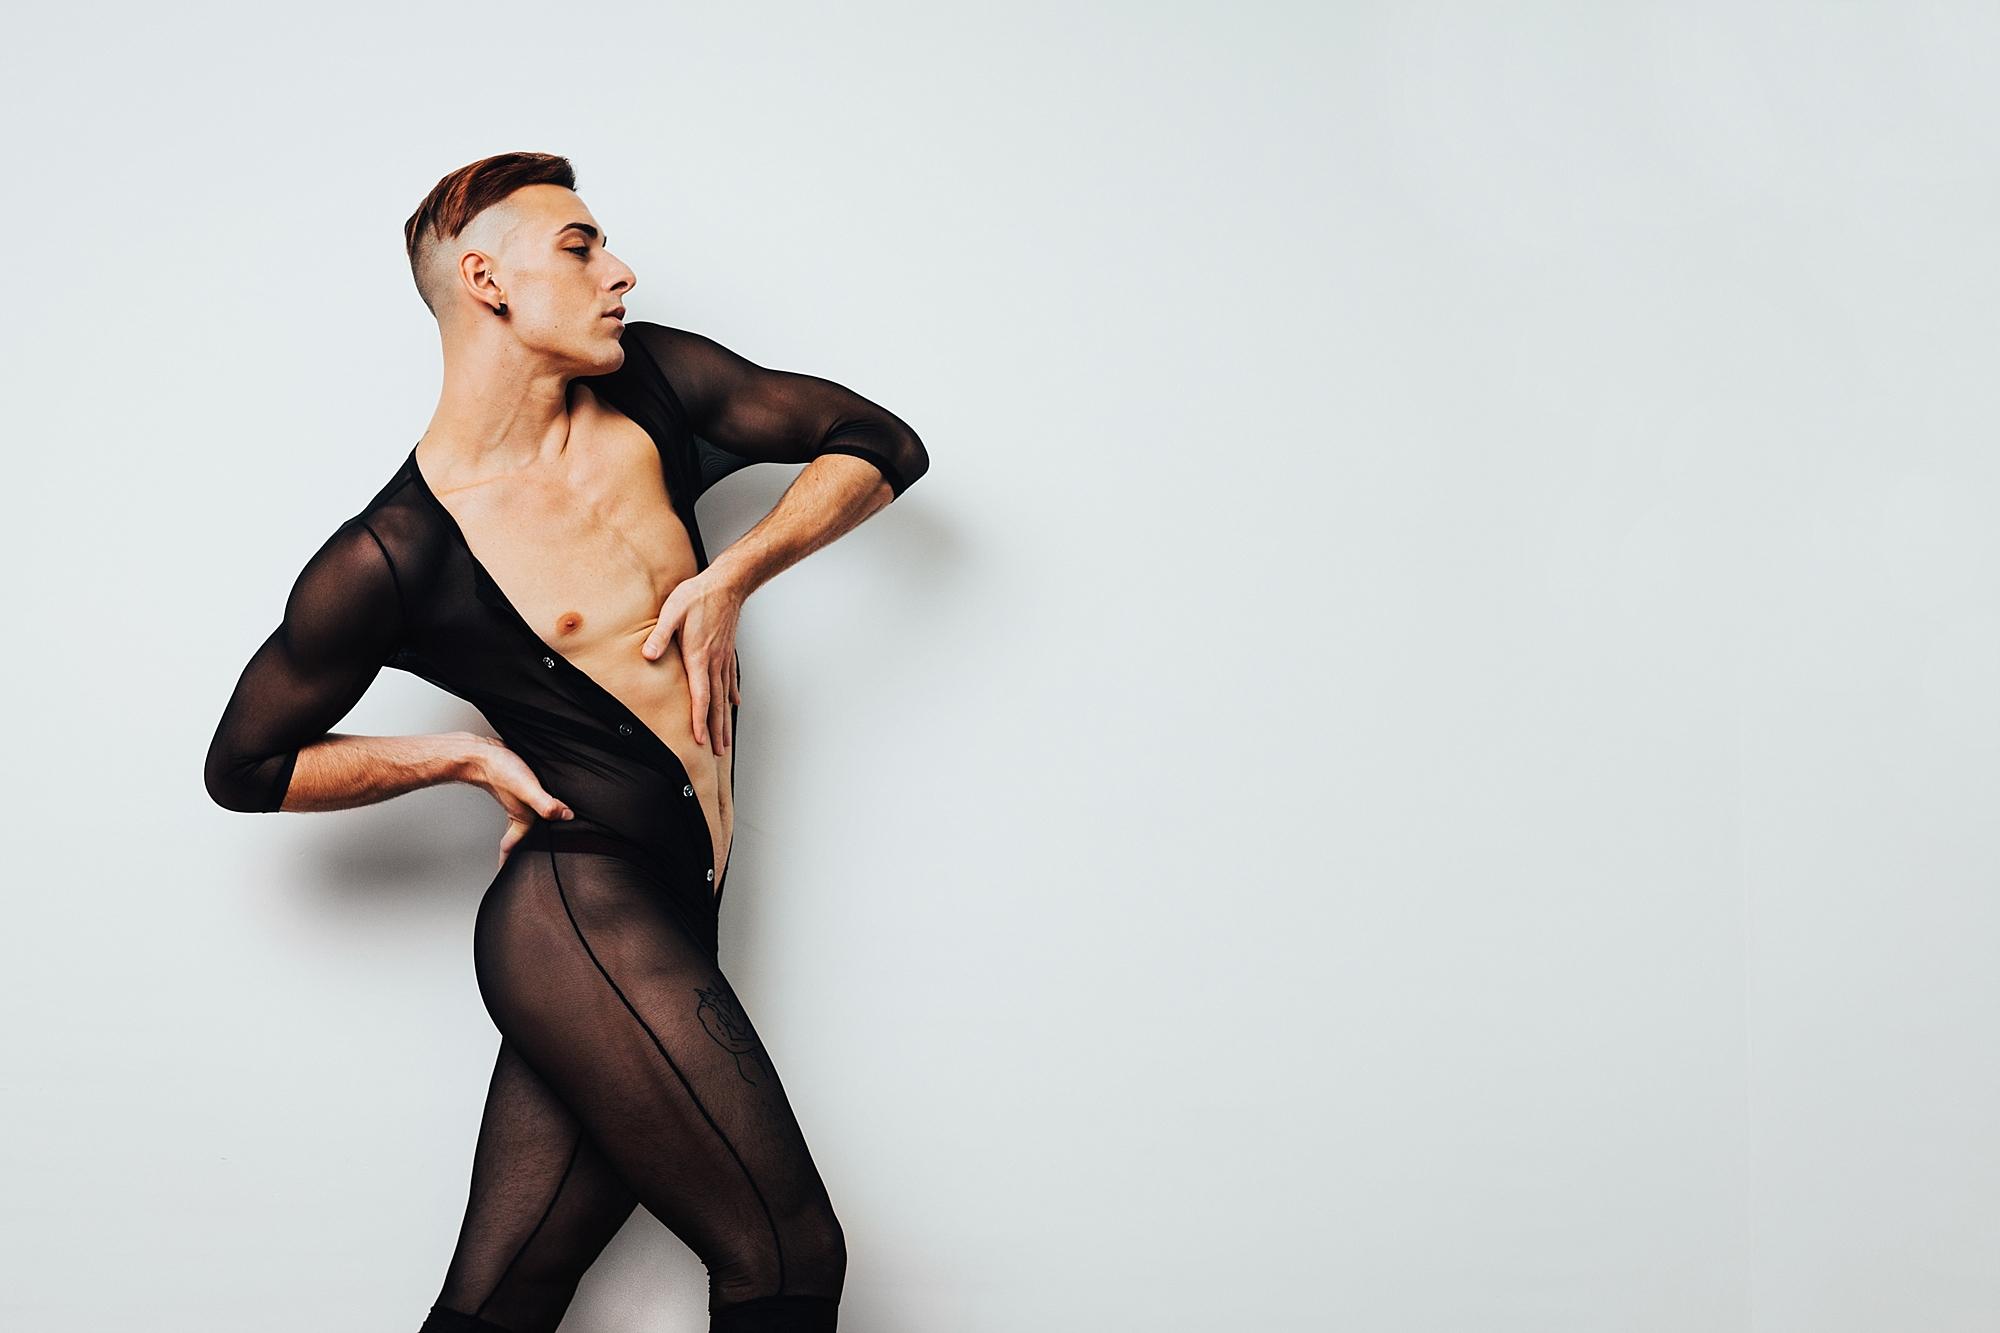 Joe_Mac_Creative_Joey_Arrigo_Philadelphia_Gay_Fashion_Photography__0013.jpg